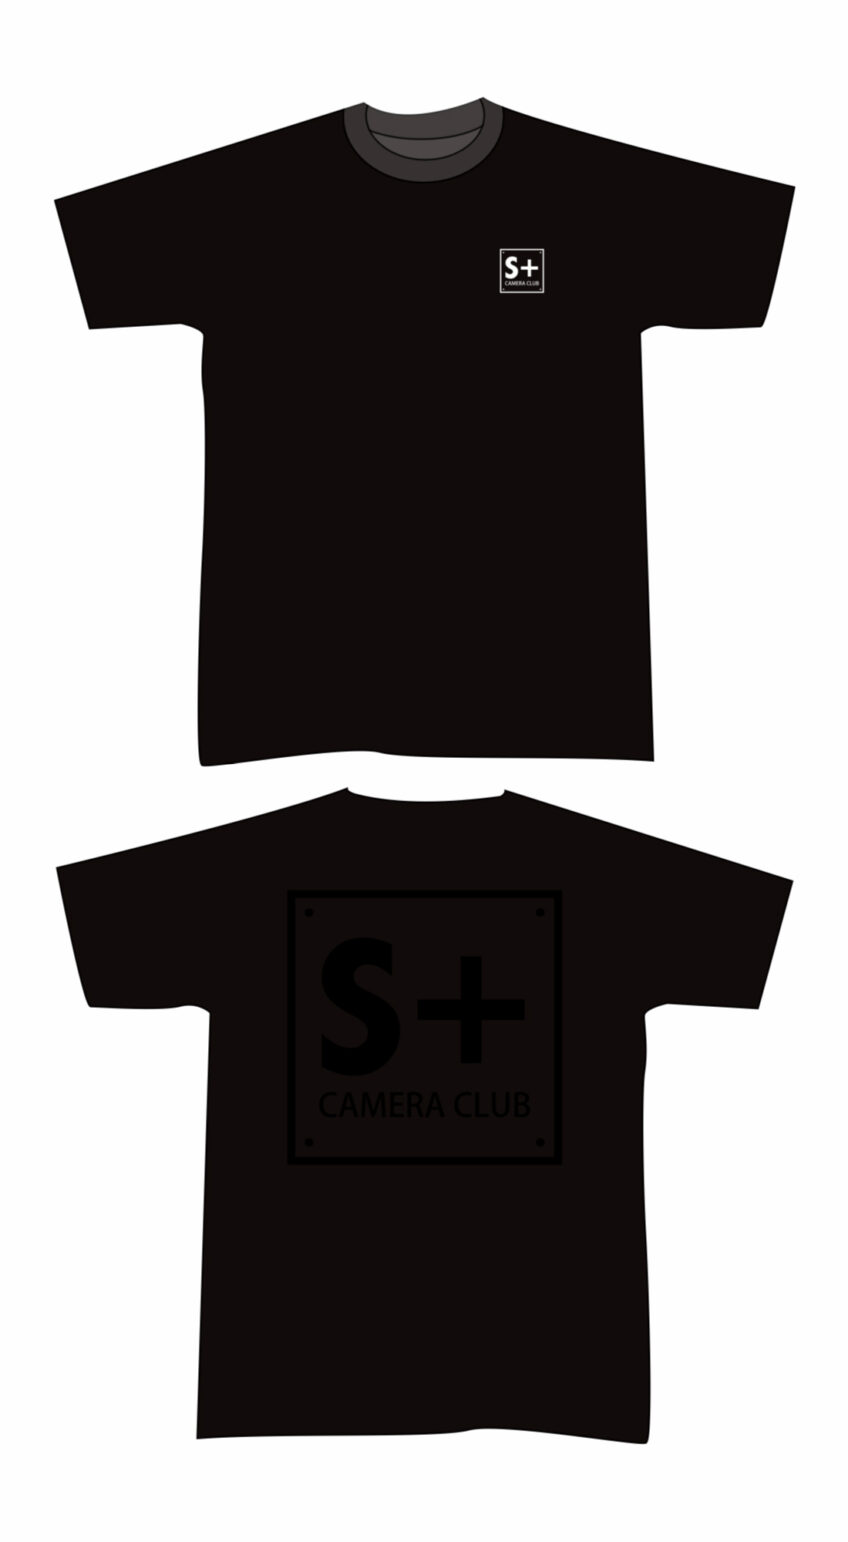 【S+CAMERACLUB】エスプラスカメラクラブ ロゴ入りTシャツ ブラック